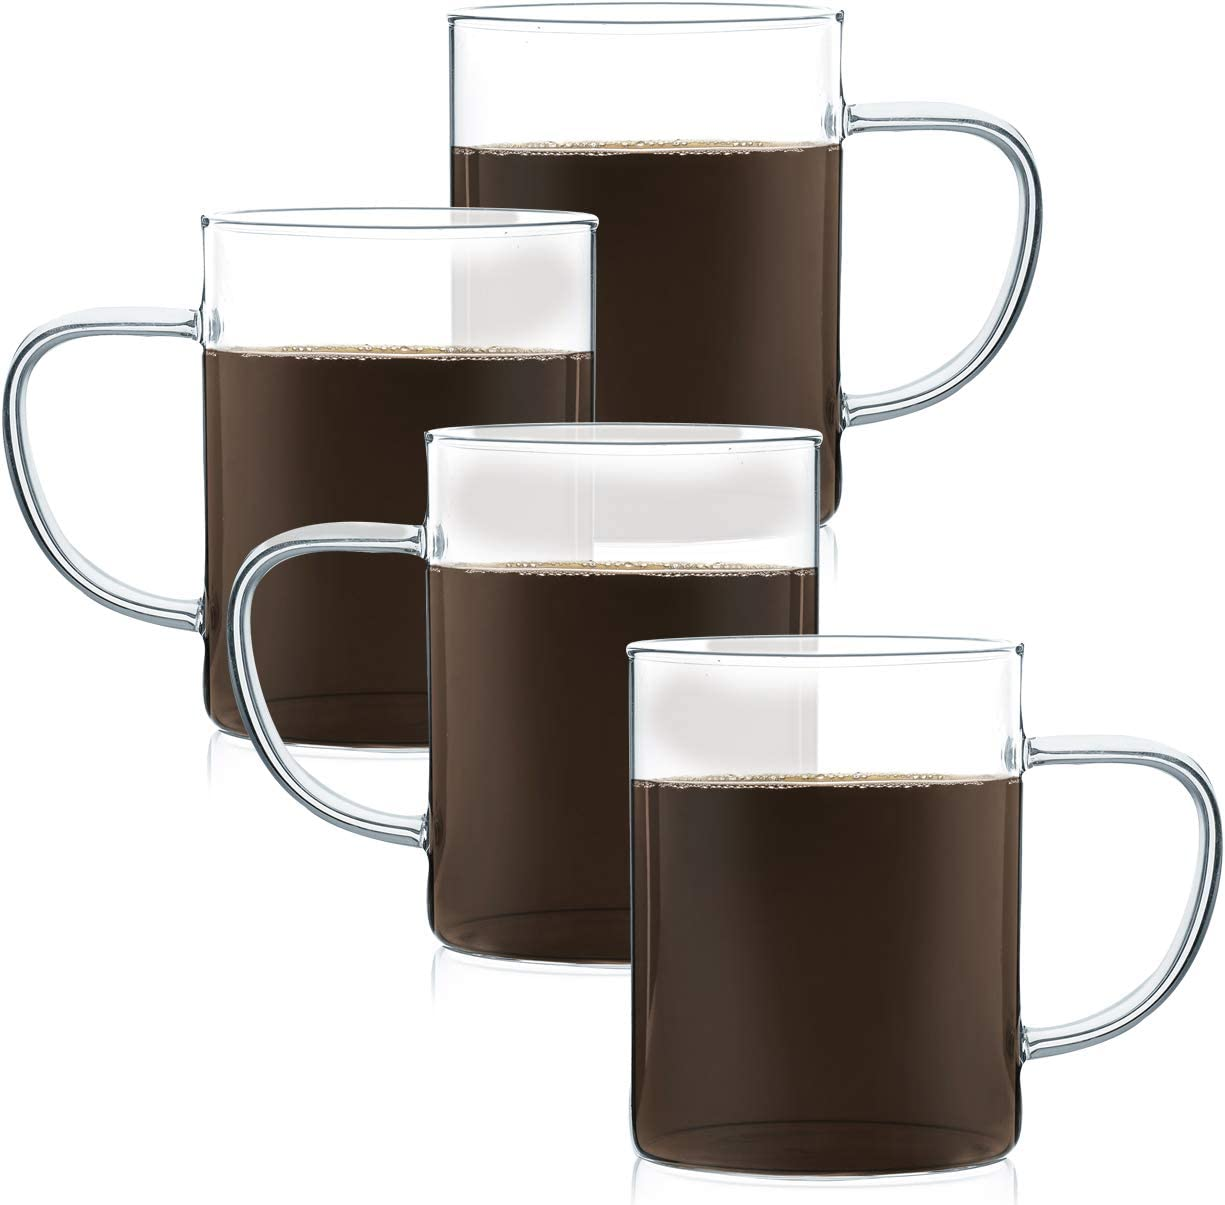 JavaFly Maurea Glass Mug 10.5 oz, 4 Pack, Clear